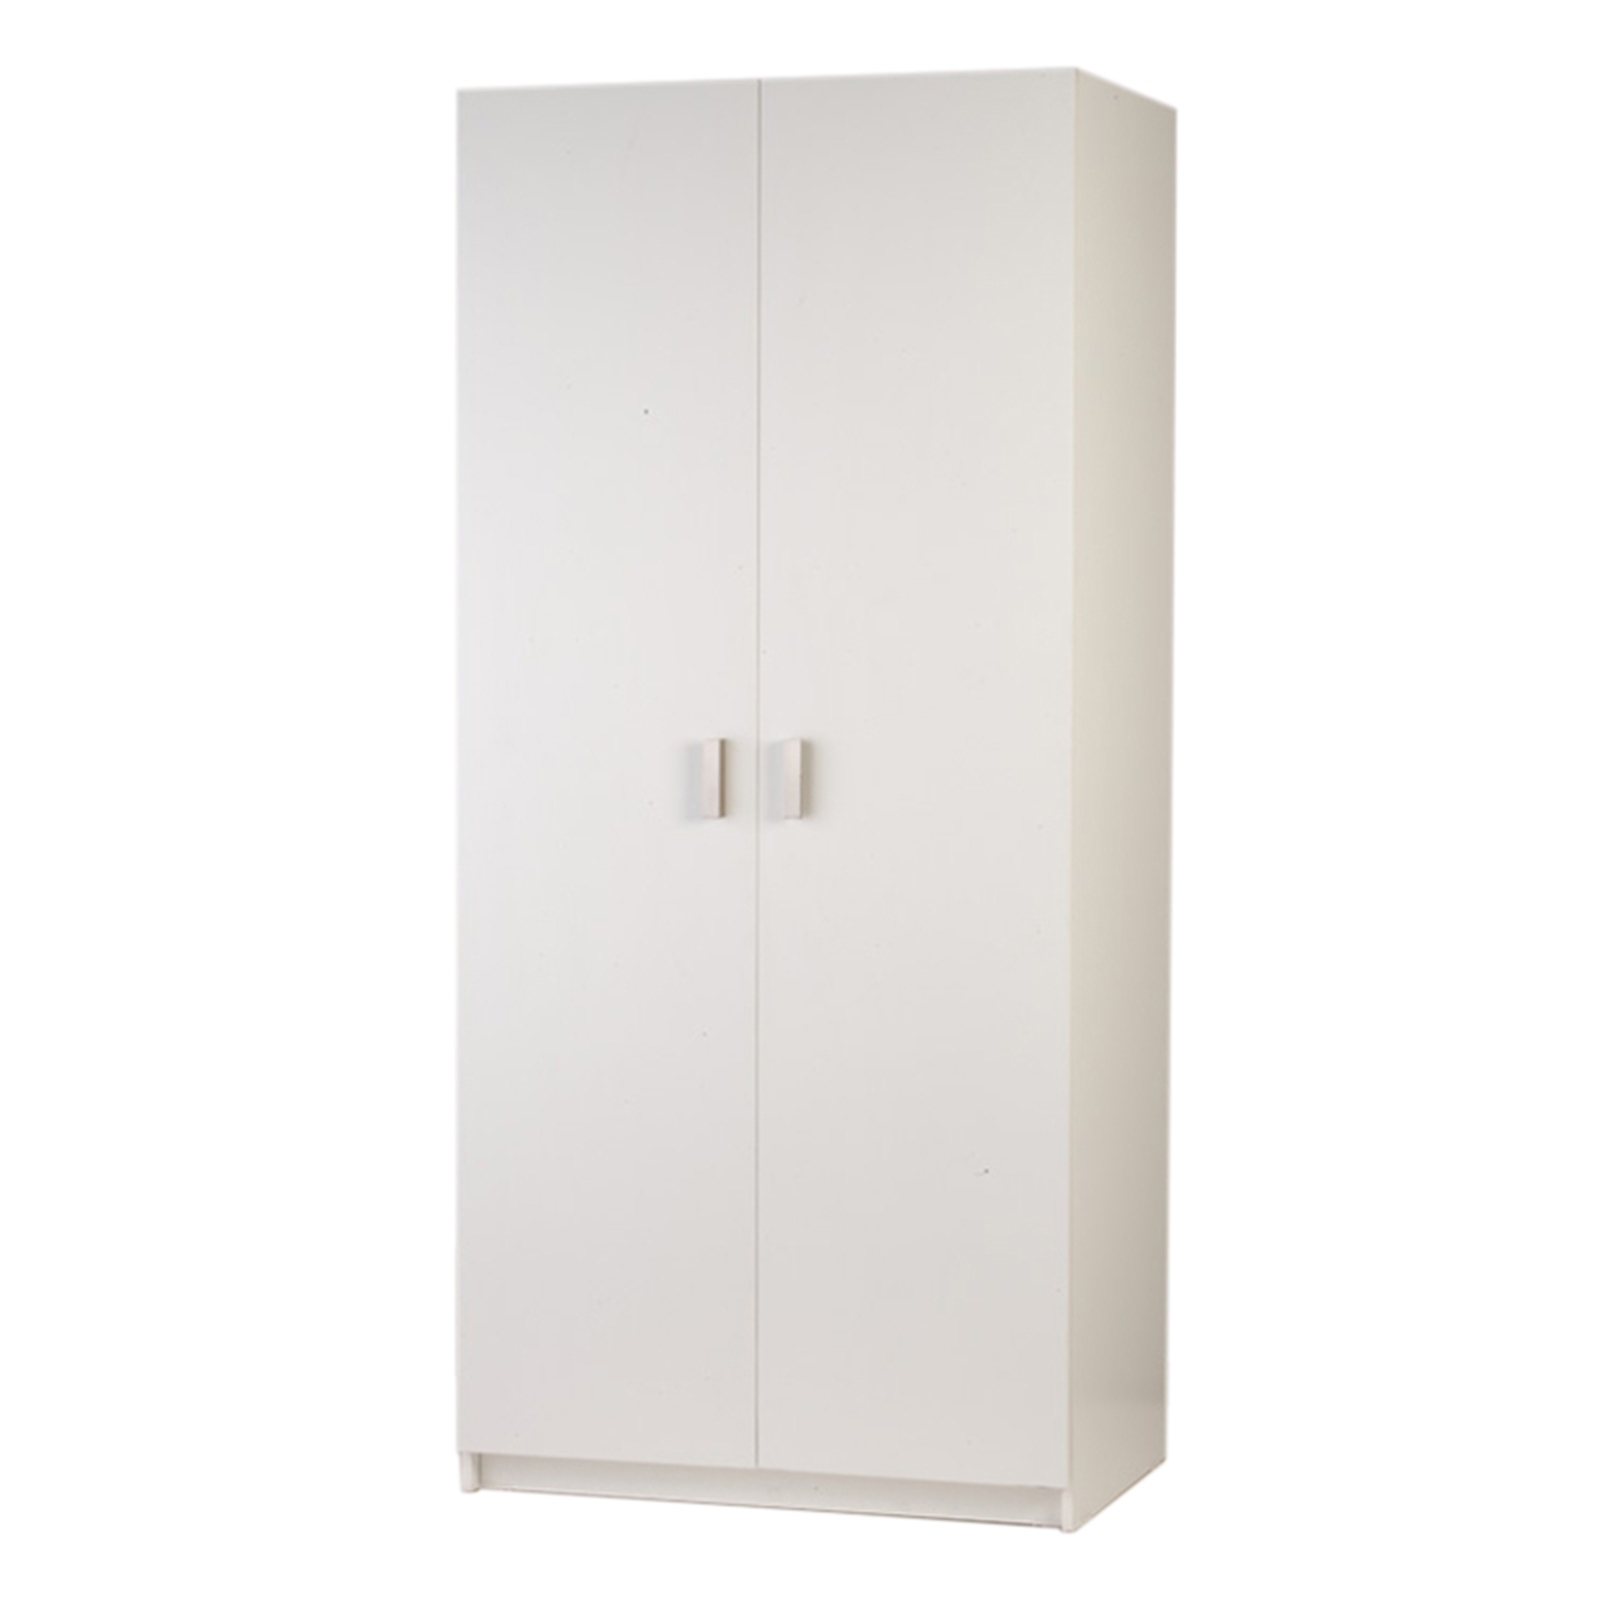 Bedford 900mm White 2 Door Wardrobe